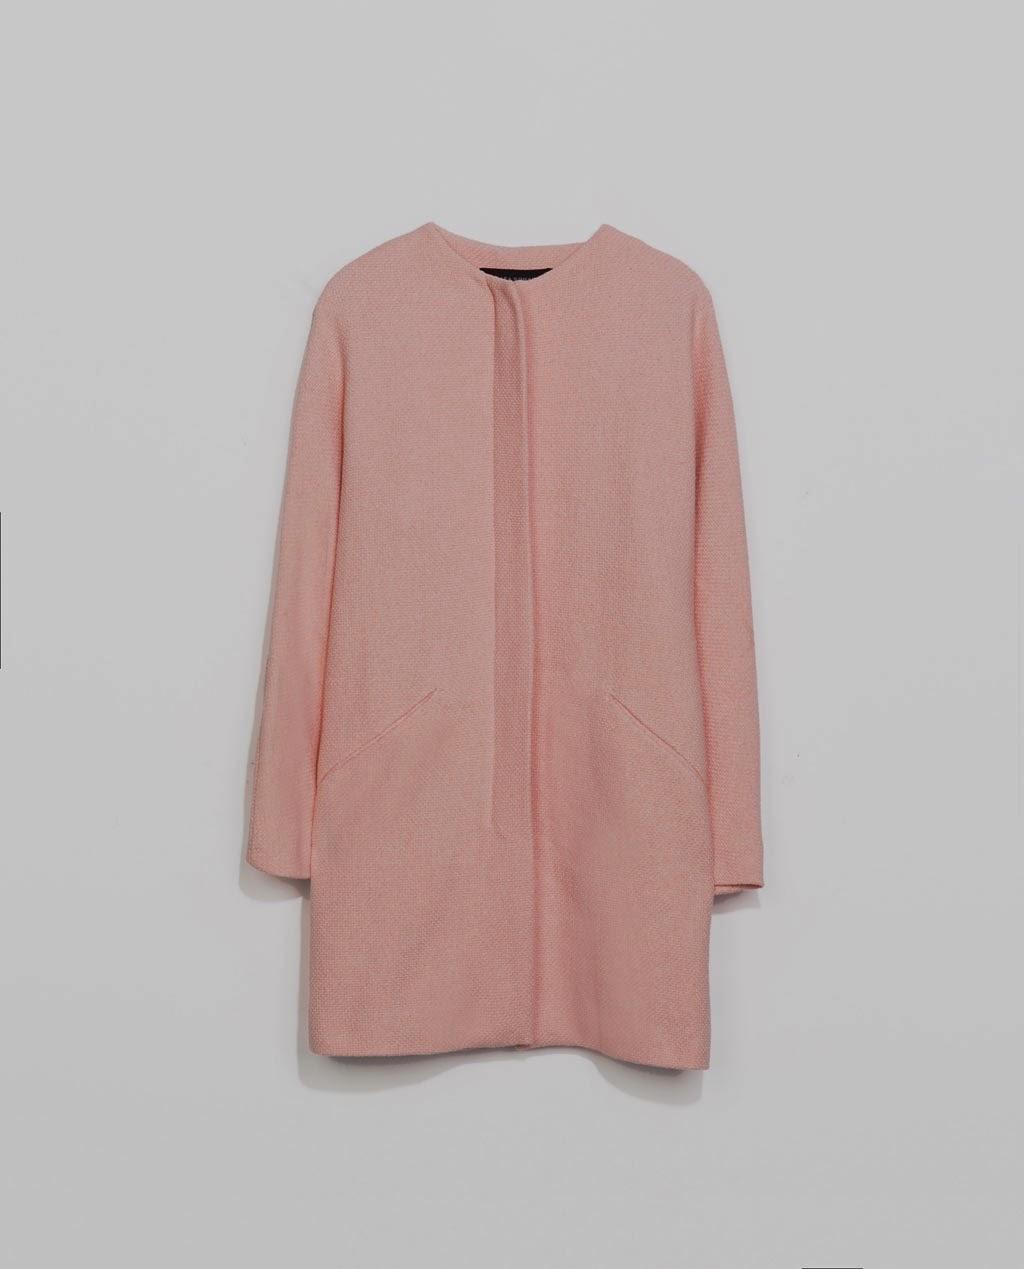 Pink Coat from Zara